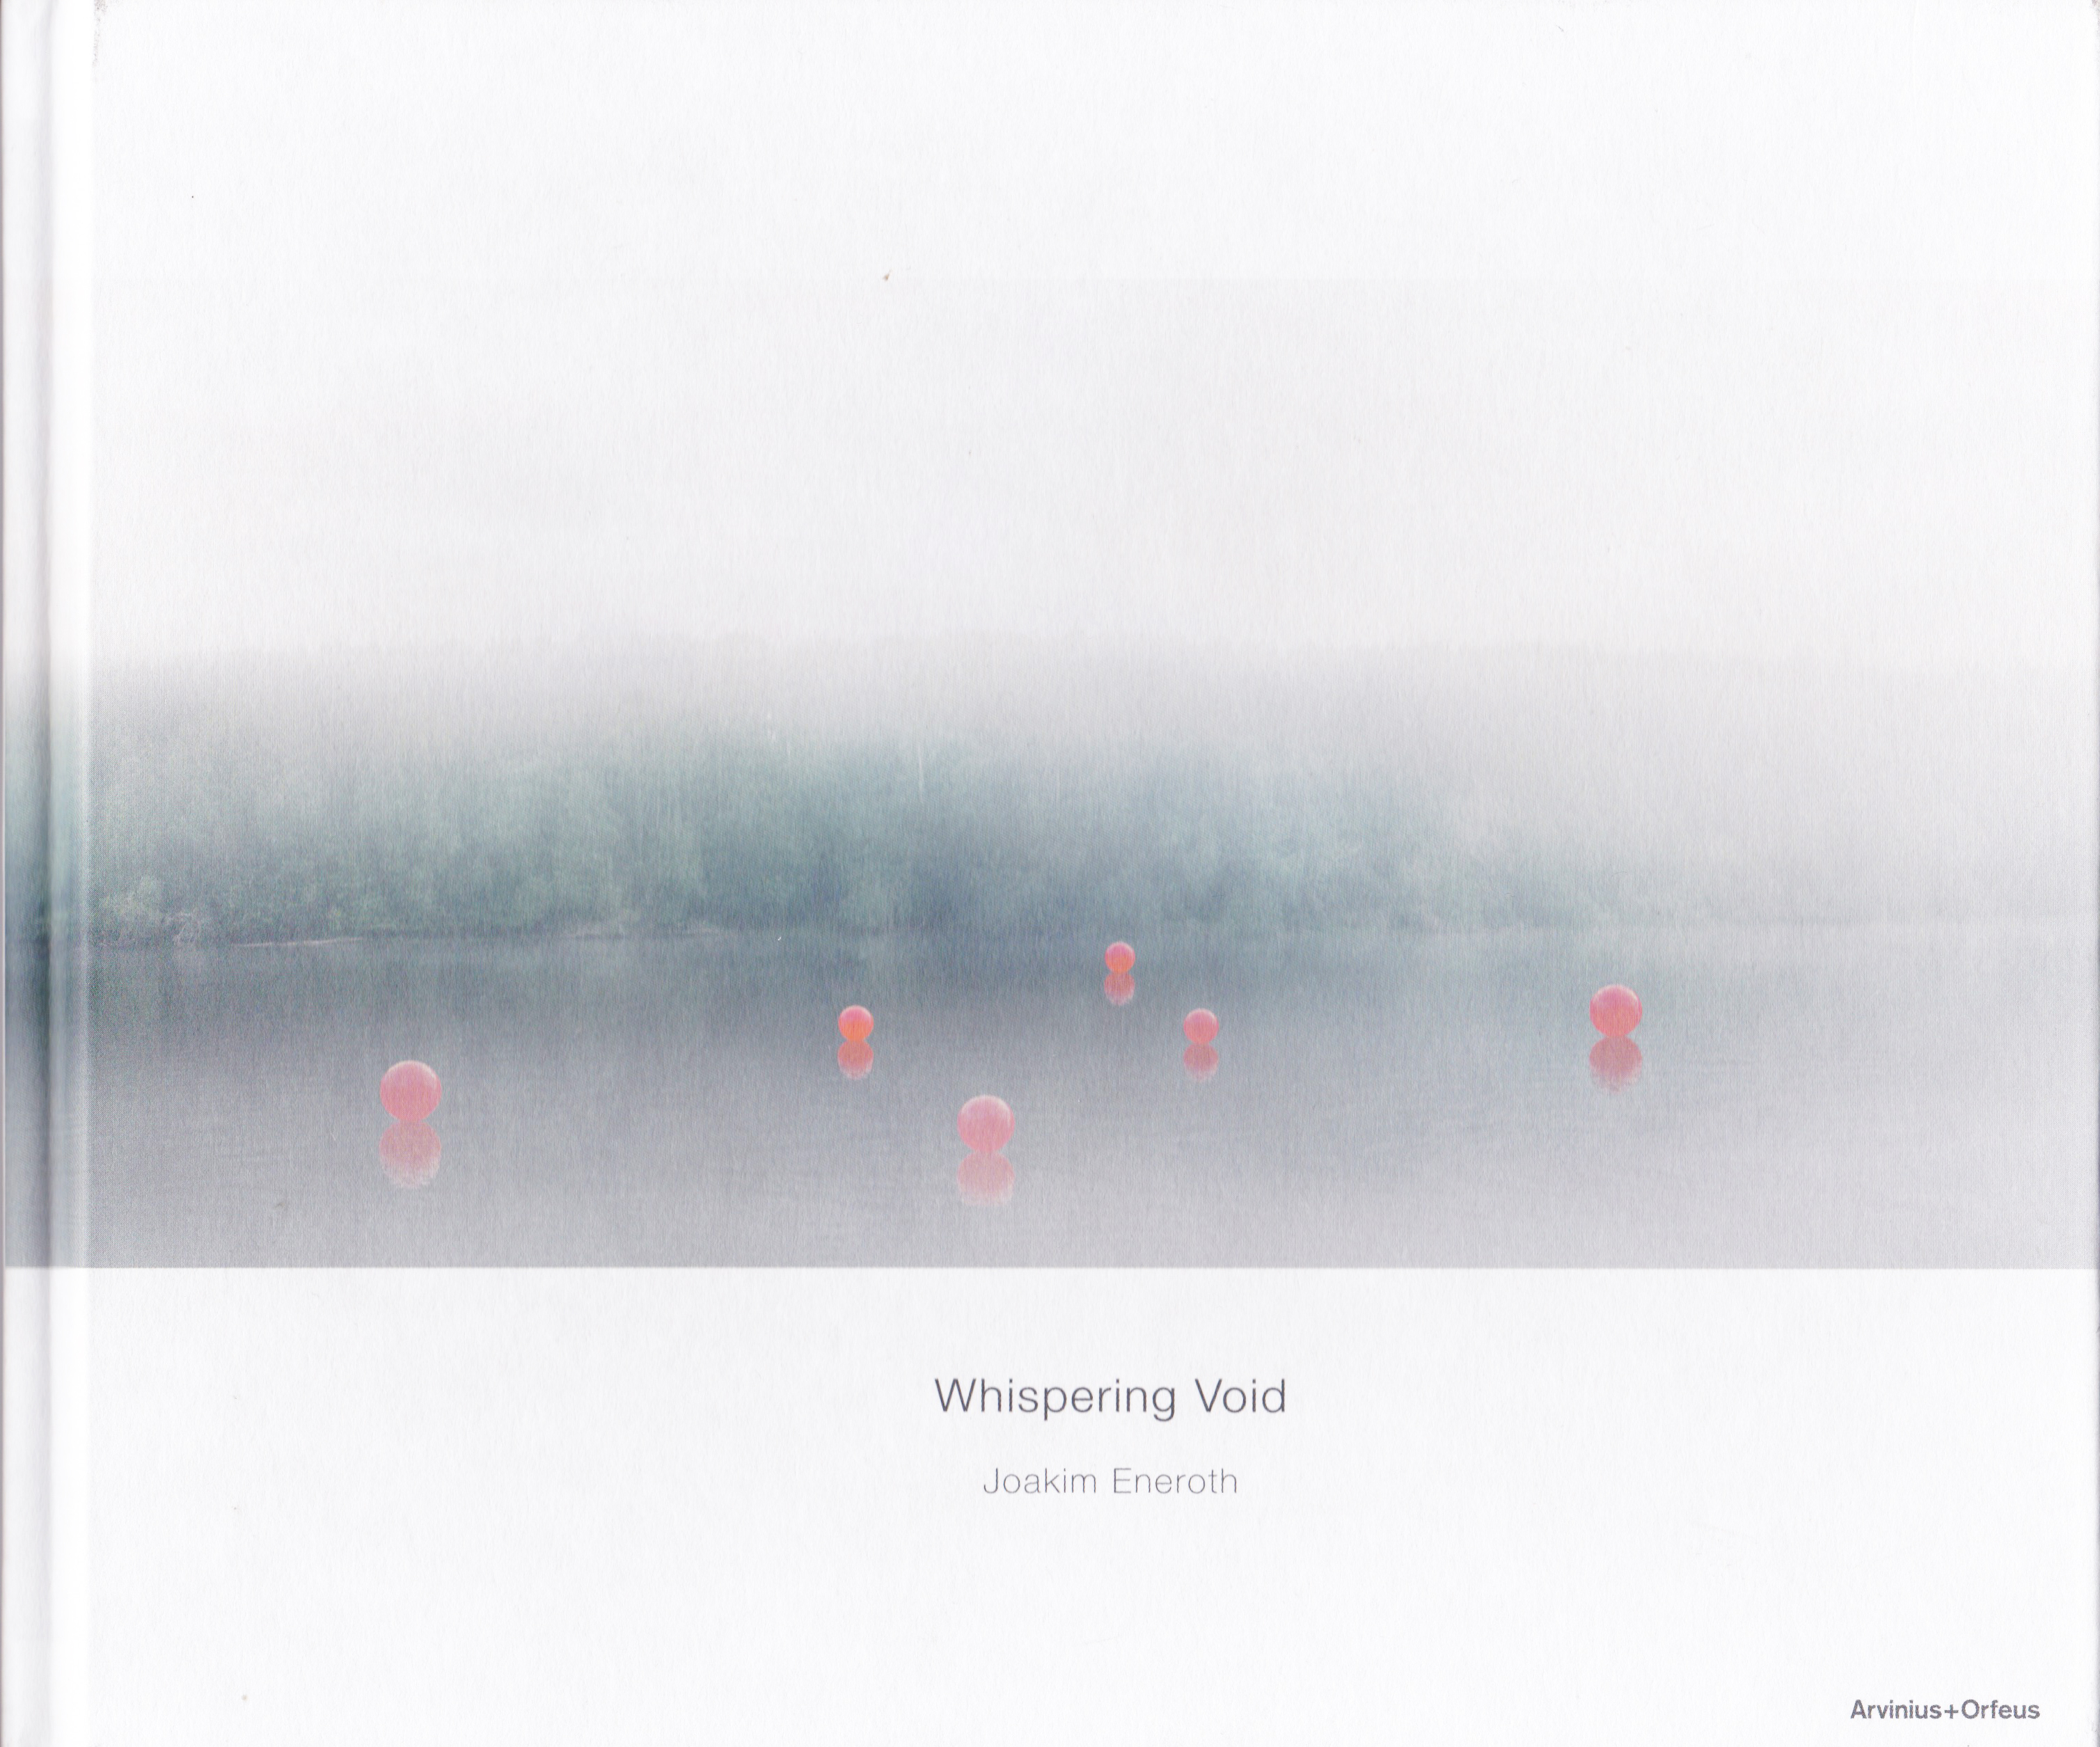 Whispering Void – Joakim Eneroth